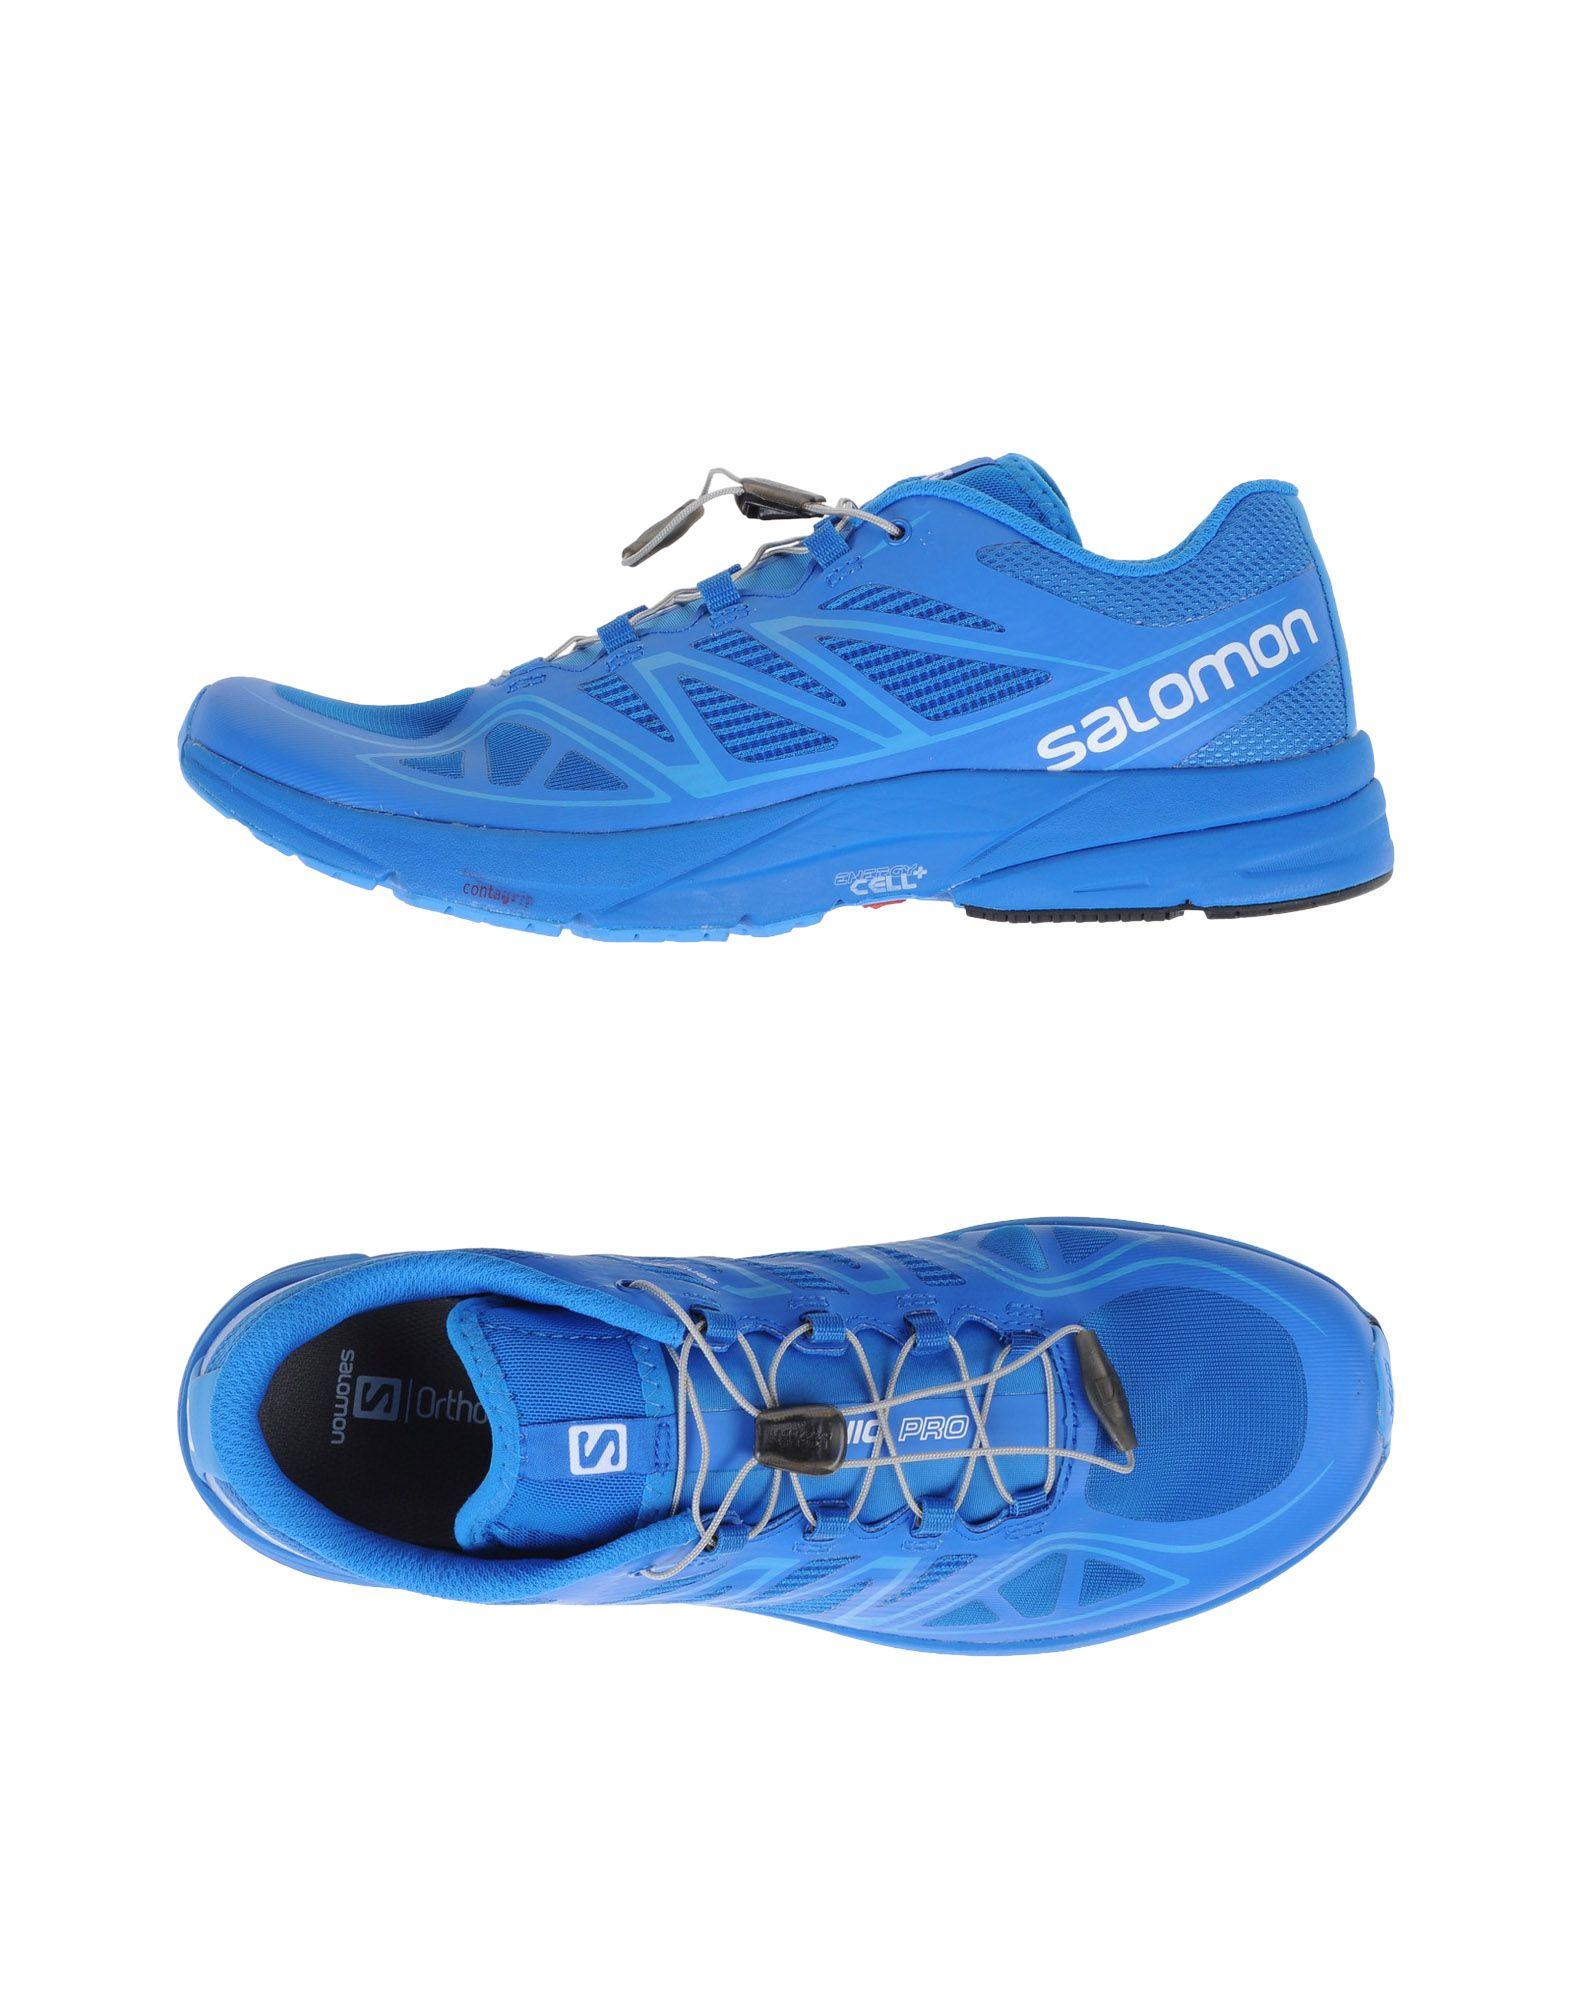 Sneakers Salomon Sonic Pro - Homme - Sneakers Salomon sur